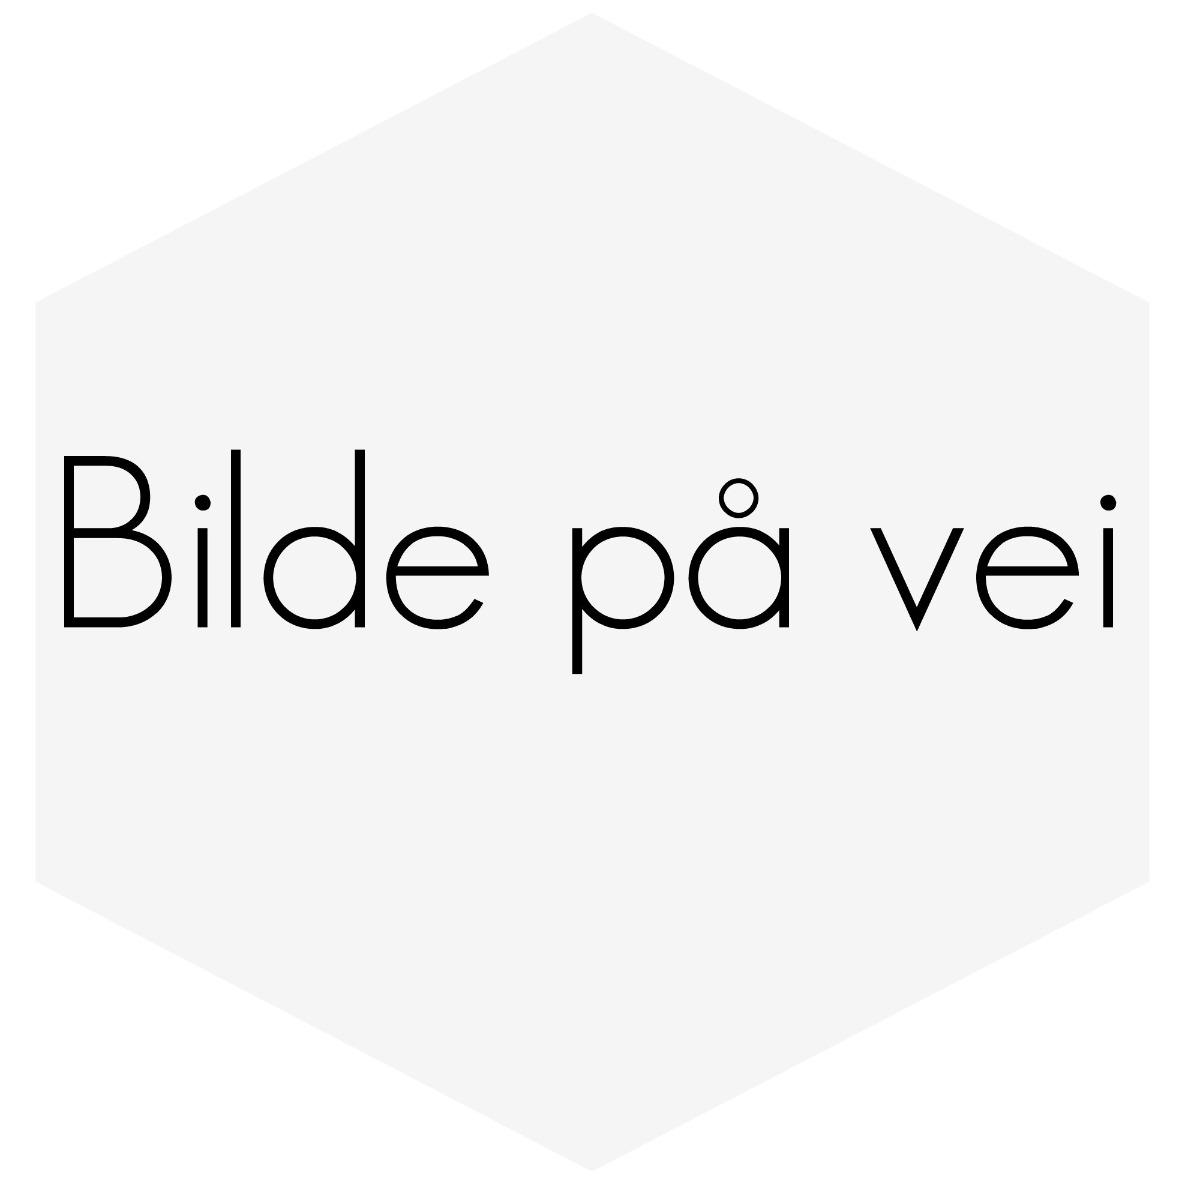 "SILIKONSLANGE RØD REDUSERING 2,375-3"" (60-76MM)"